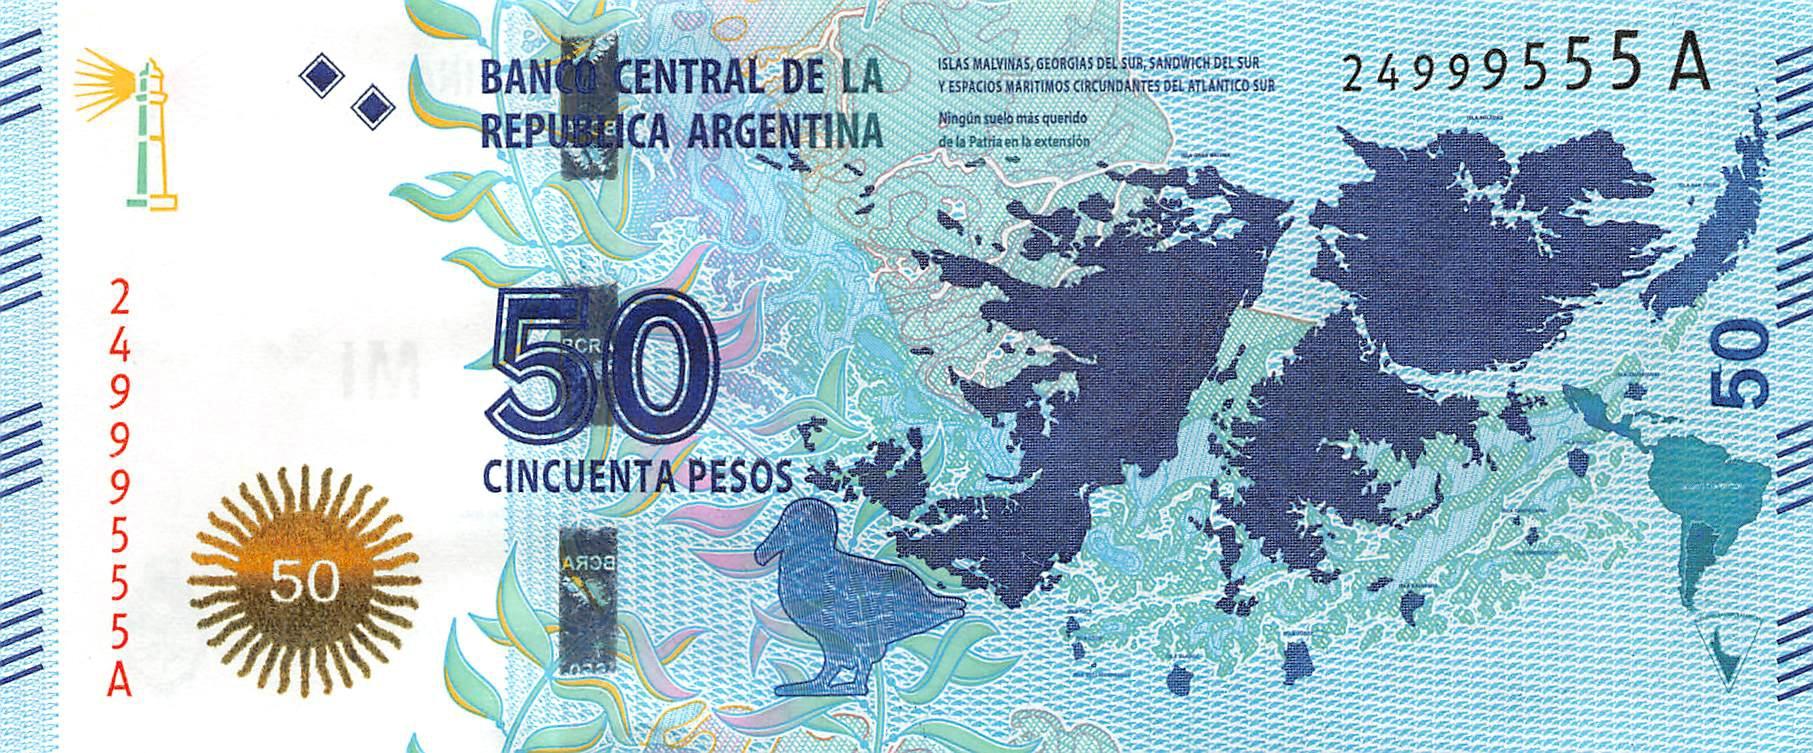 2018 ARGENTINA 50 PESOS P-NEW UNC /> ACONCAGUA MOUNTAIN SUFFIX A